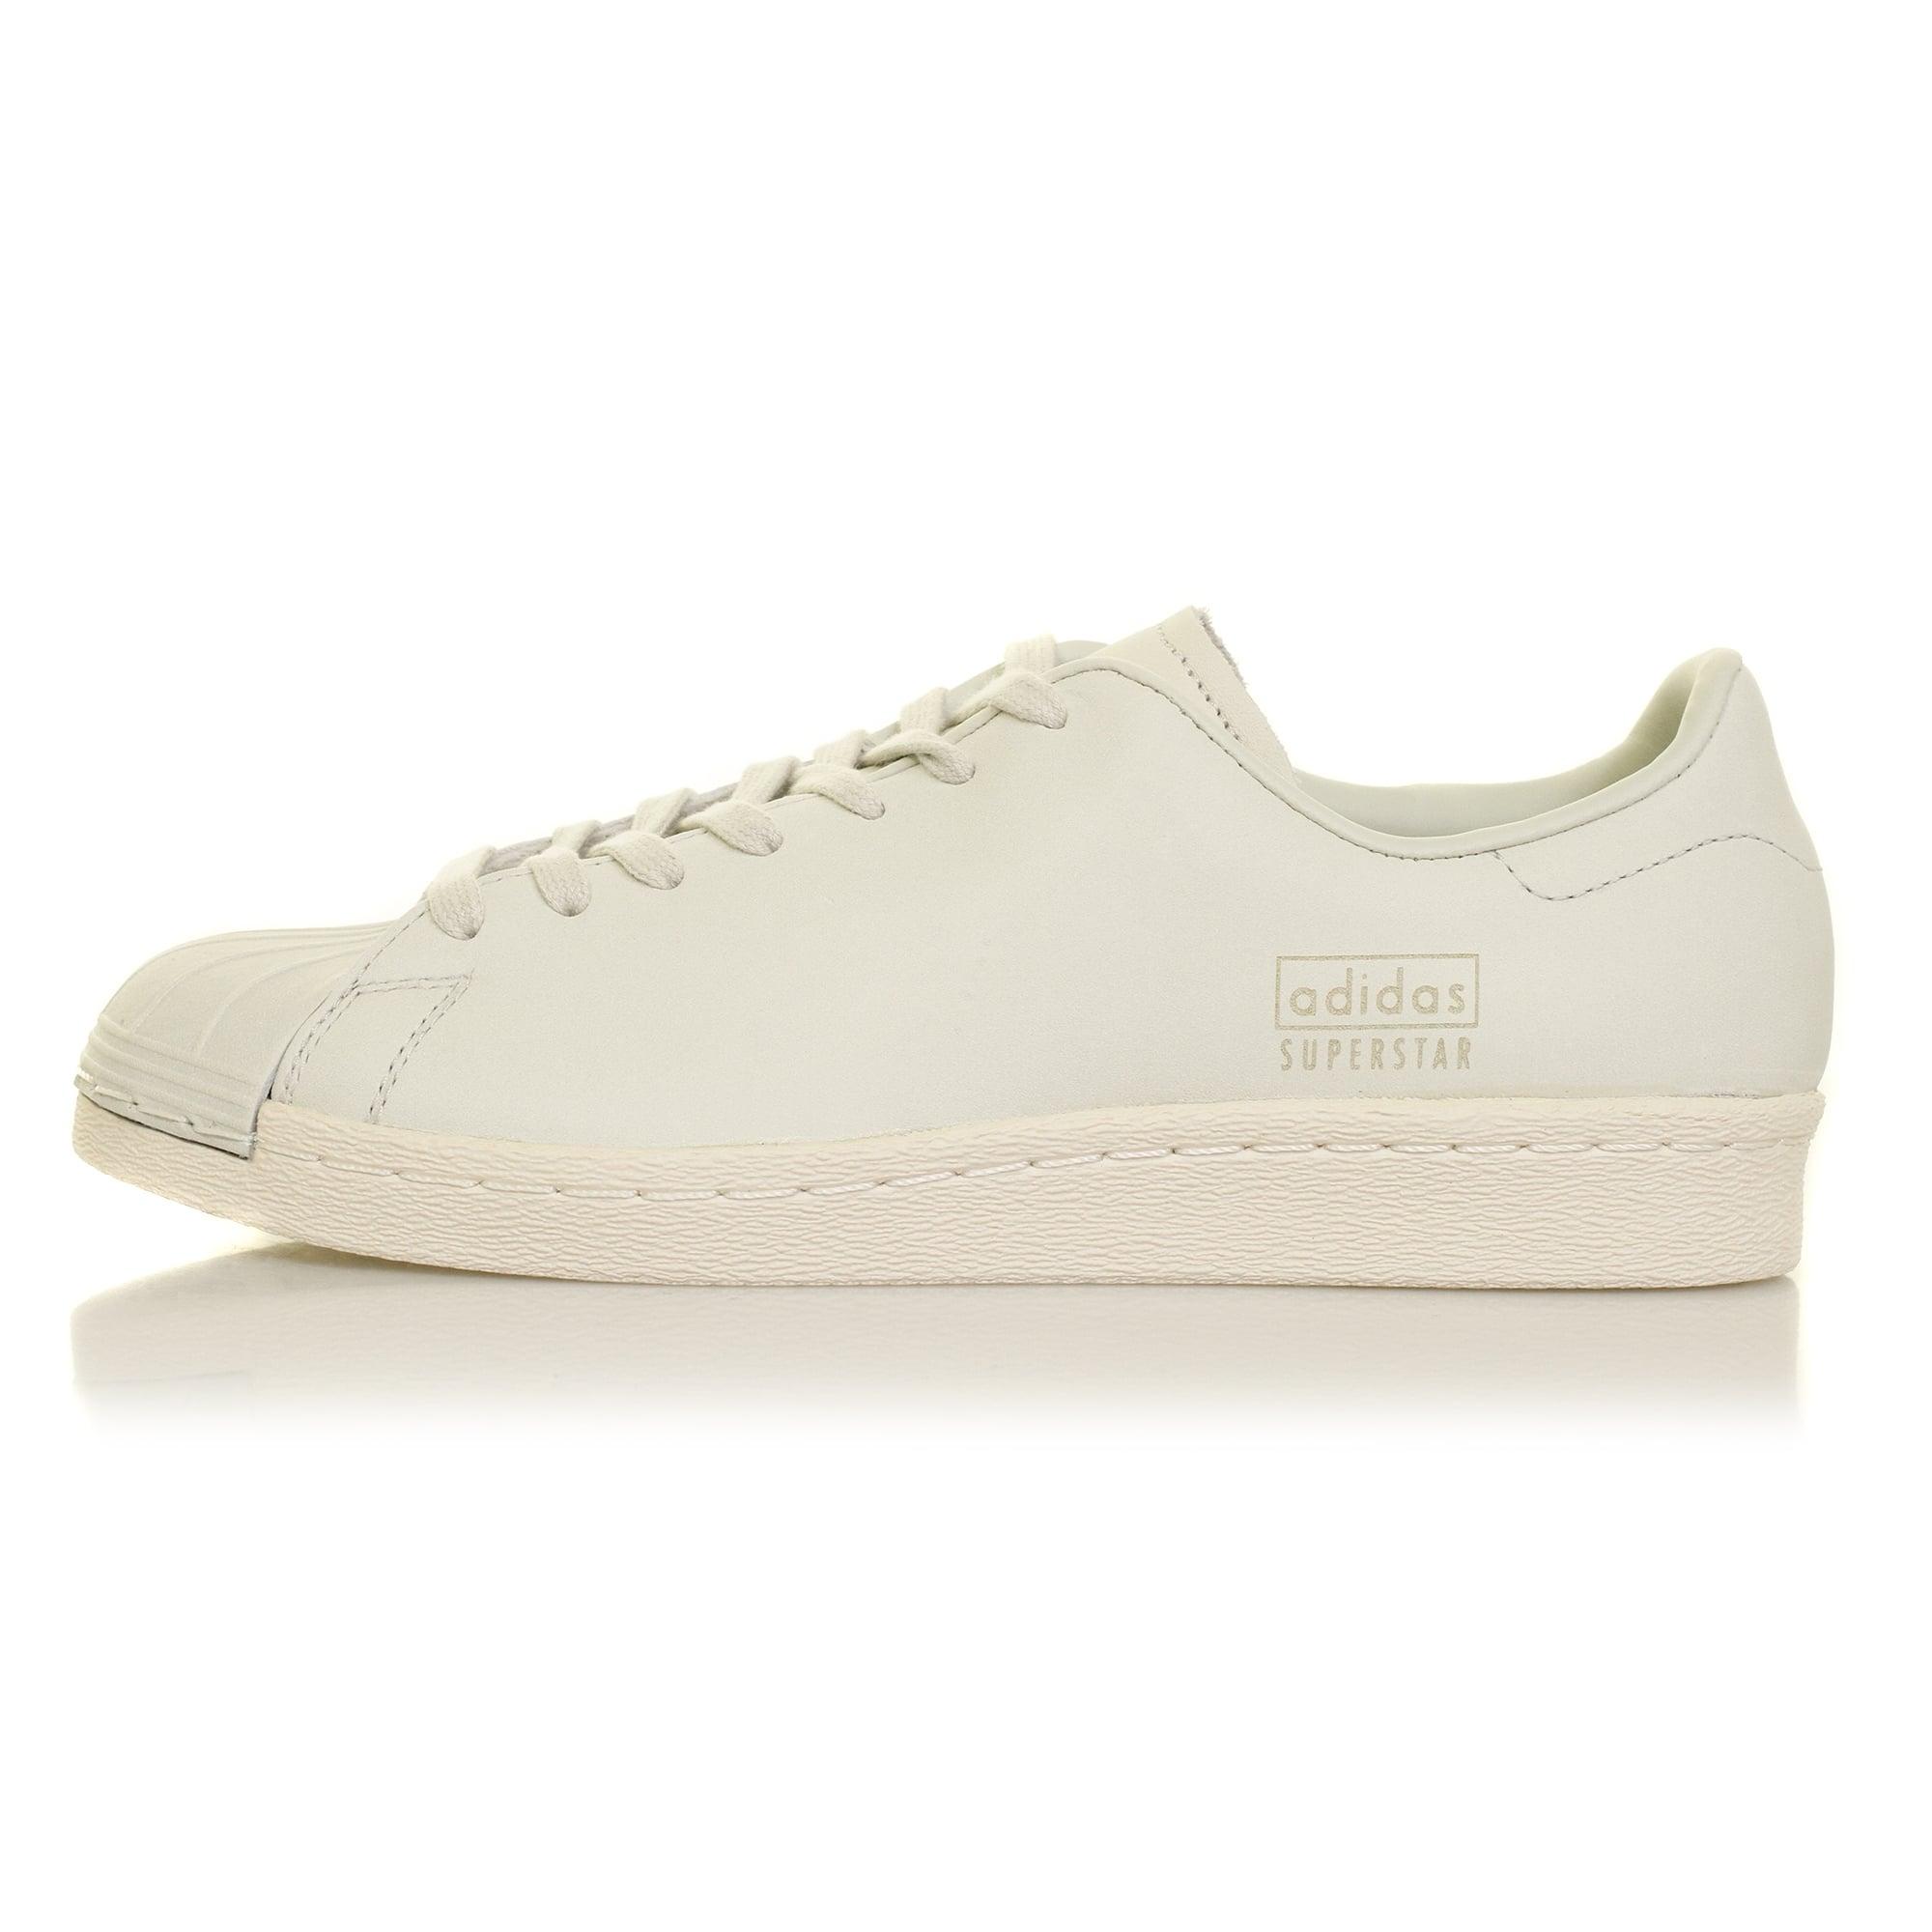 designer fashion bf7b8 89e02 adidas superstar 80s clean white